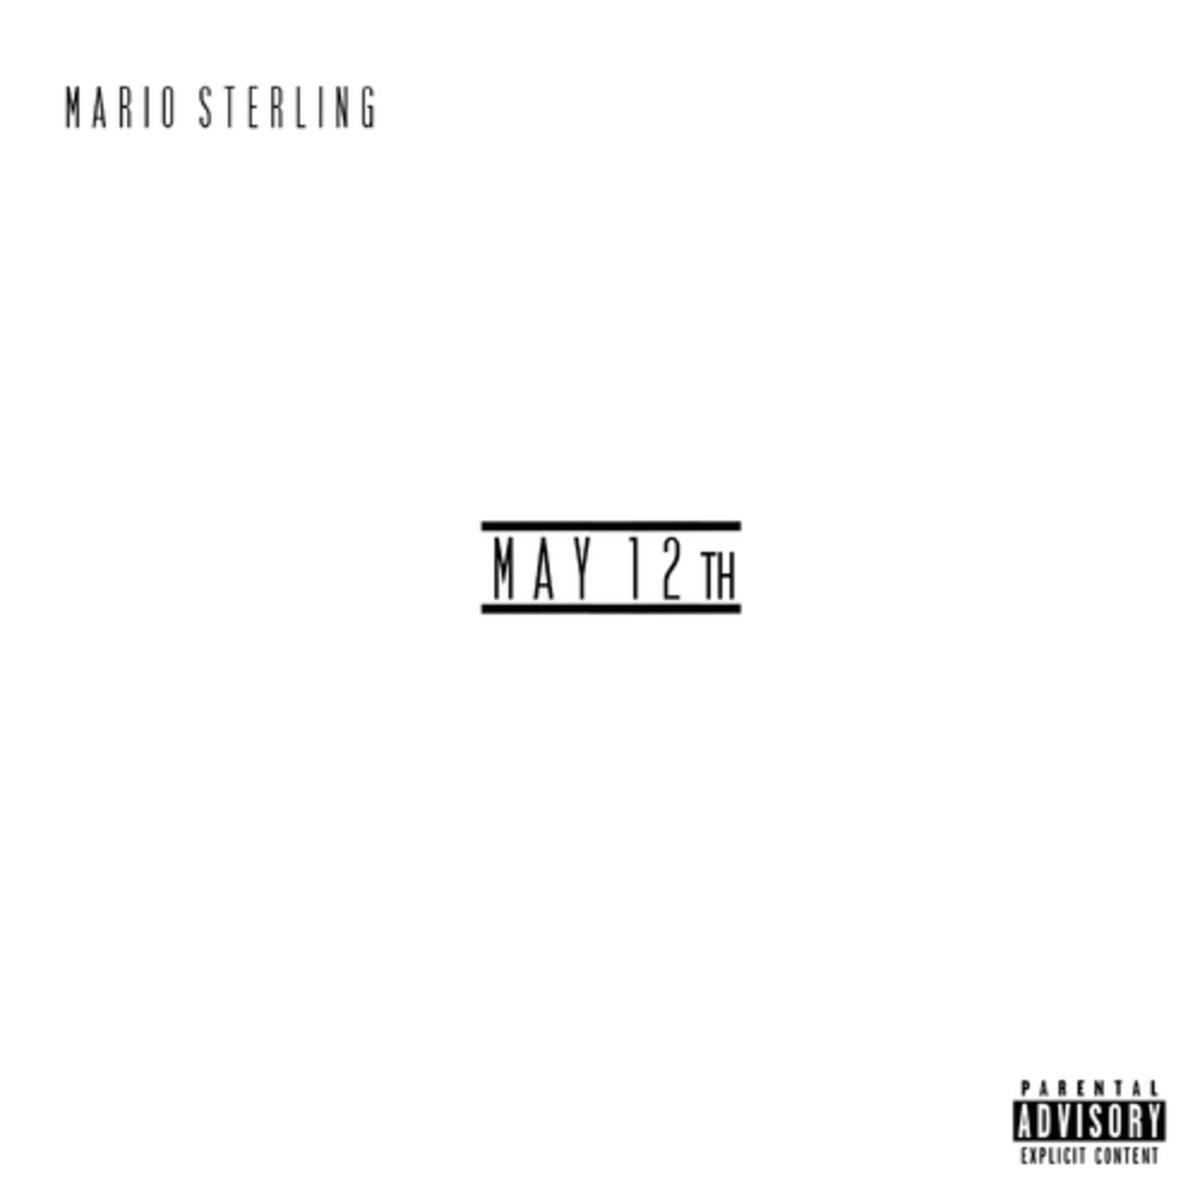 mario-sterling-may-12.jpg